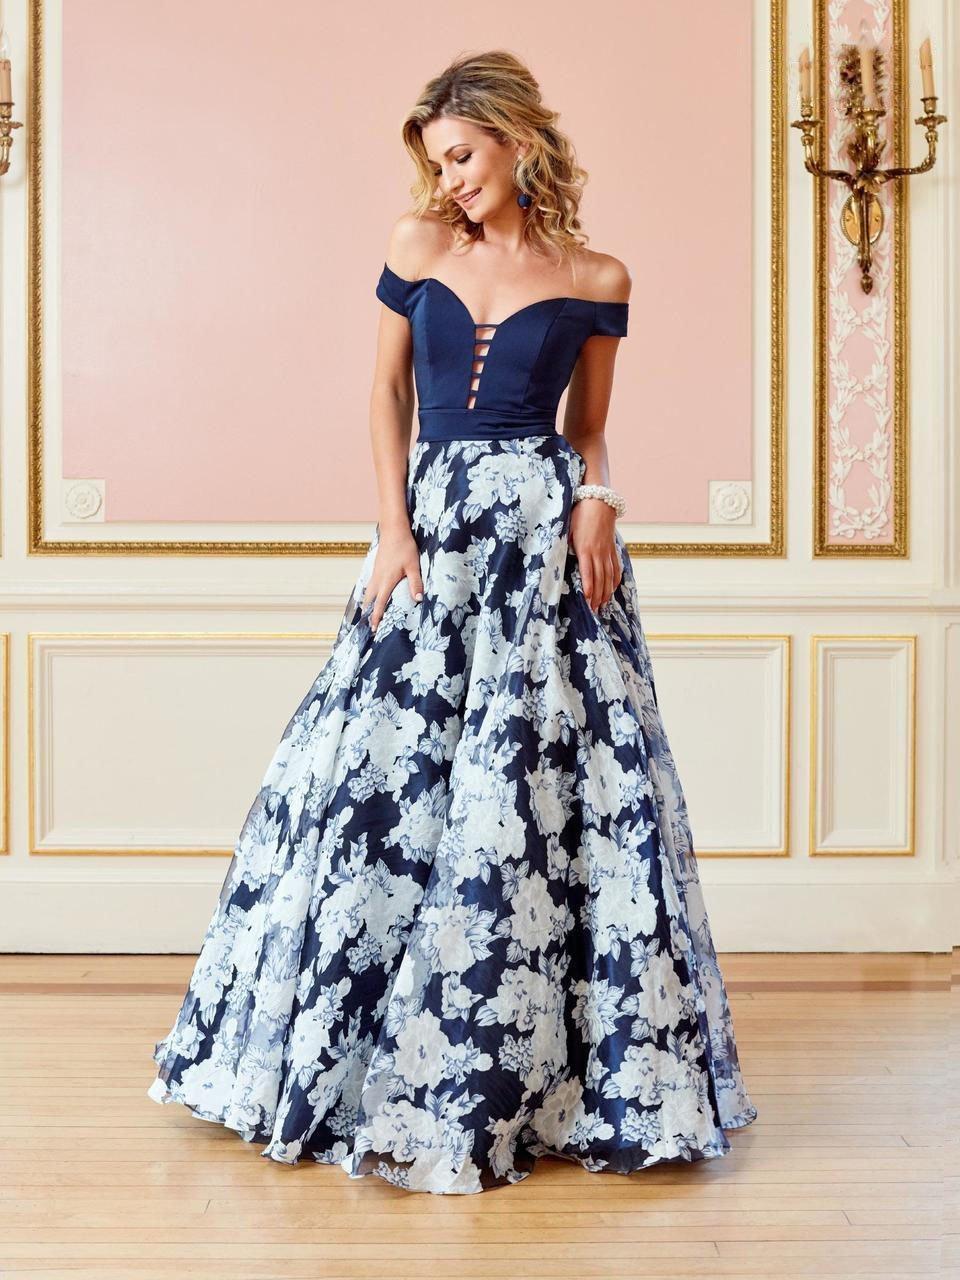 Clarisse - 4966 Off-Shoulder Plunging Floral Gown